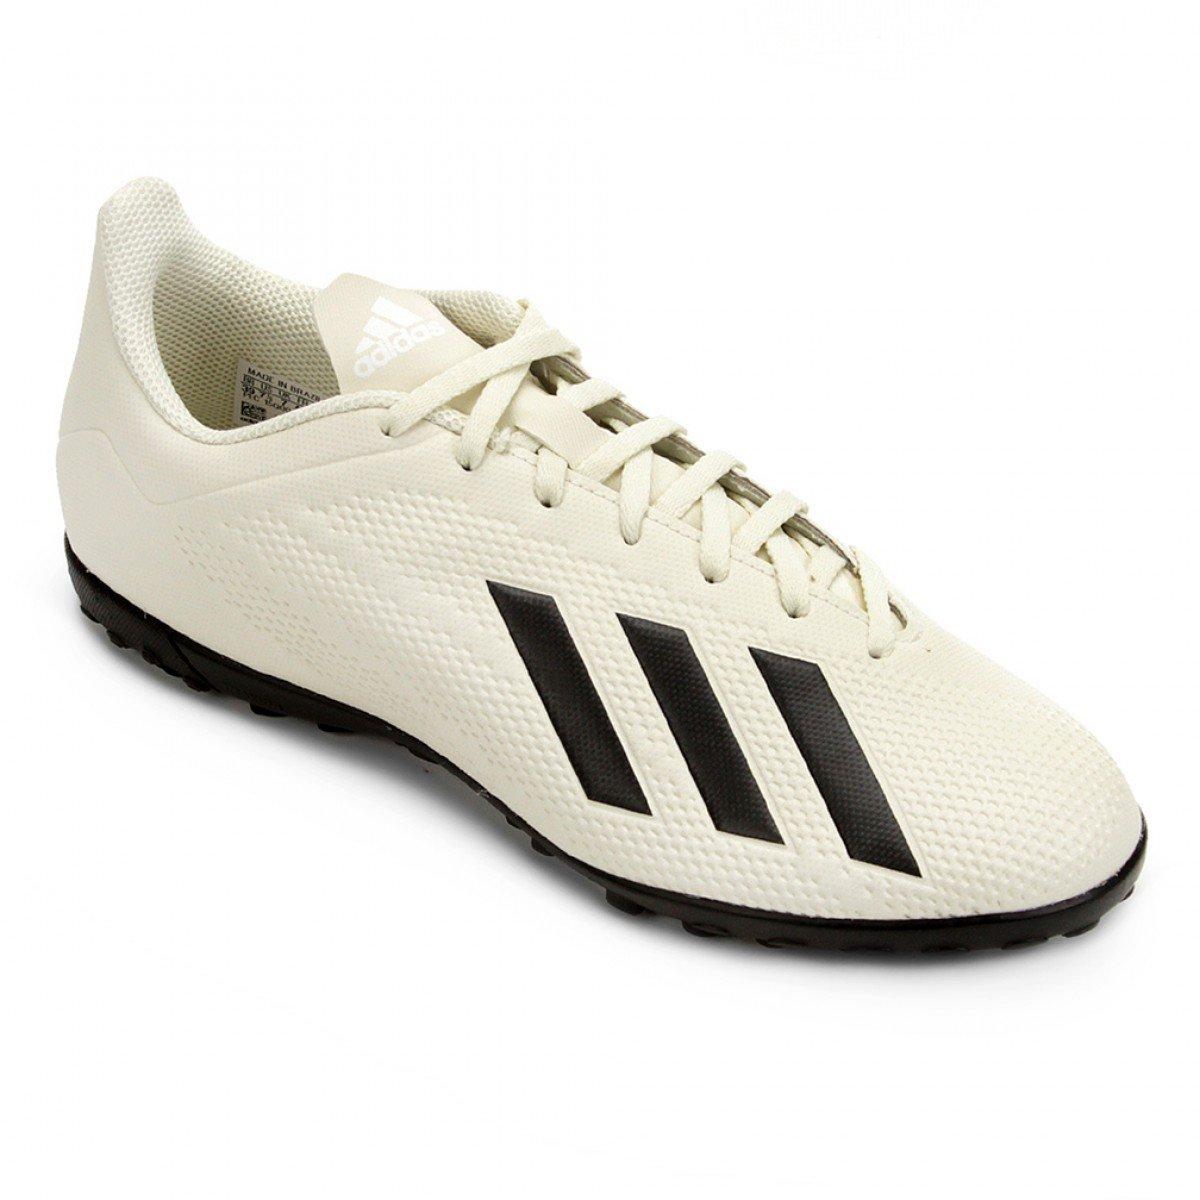 7d2d6548c4 Chuteira Society Adidas X Tango 18 4 TF Masculina - Branca e Preta ...